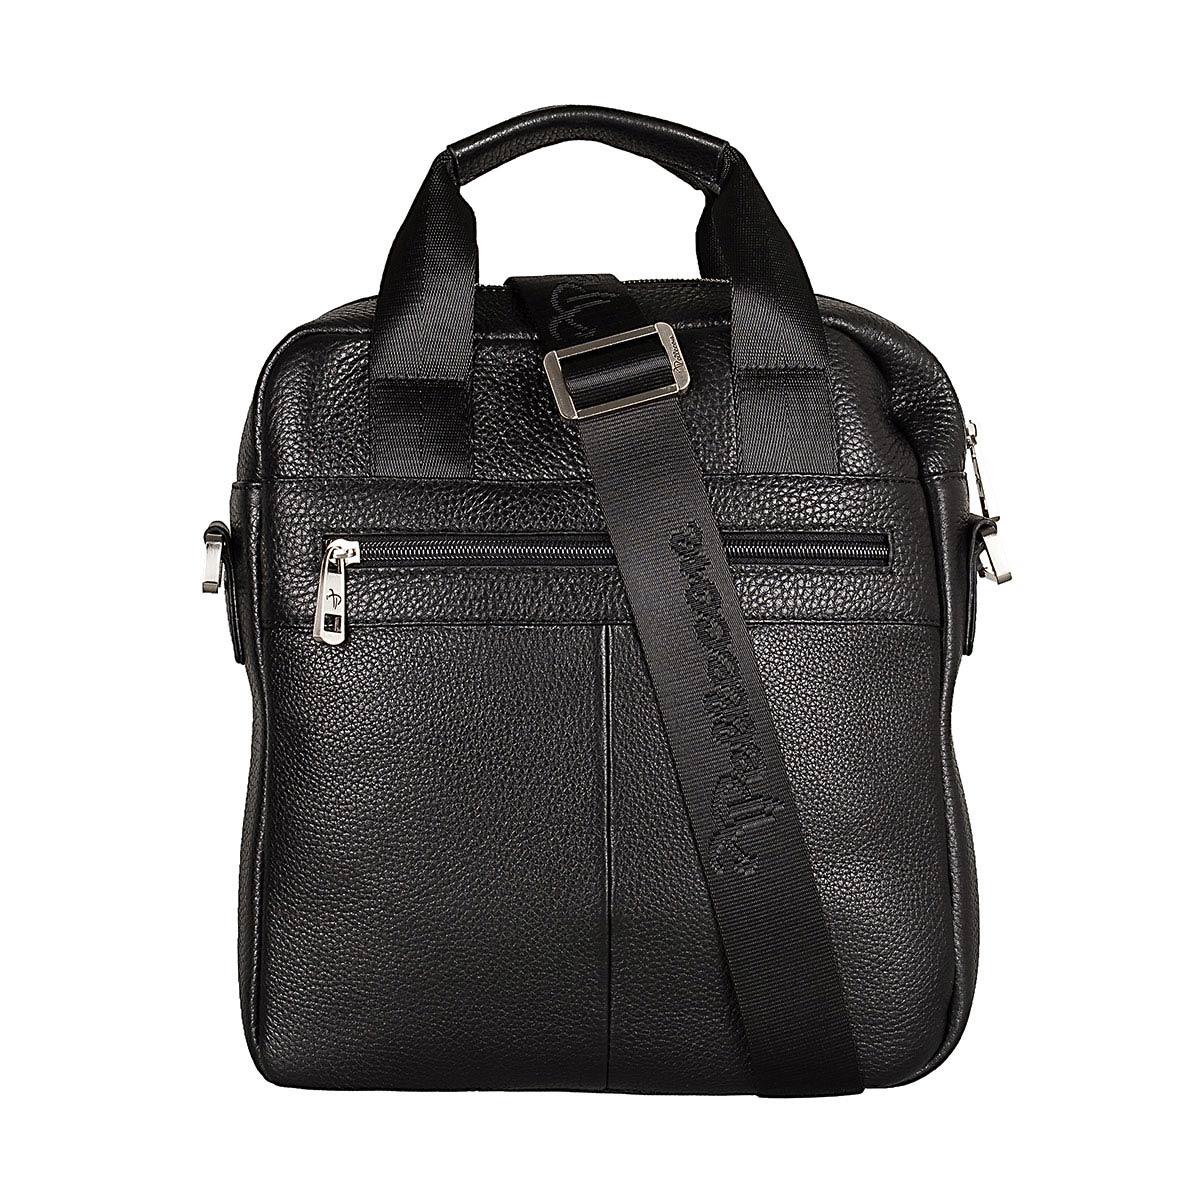 102-21516-1 Men's Bag Pellekon